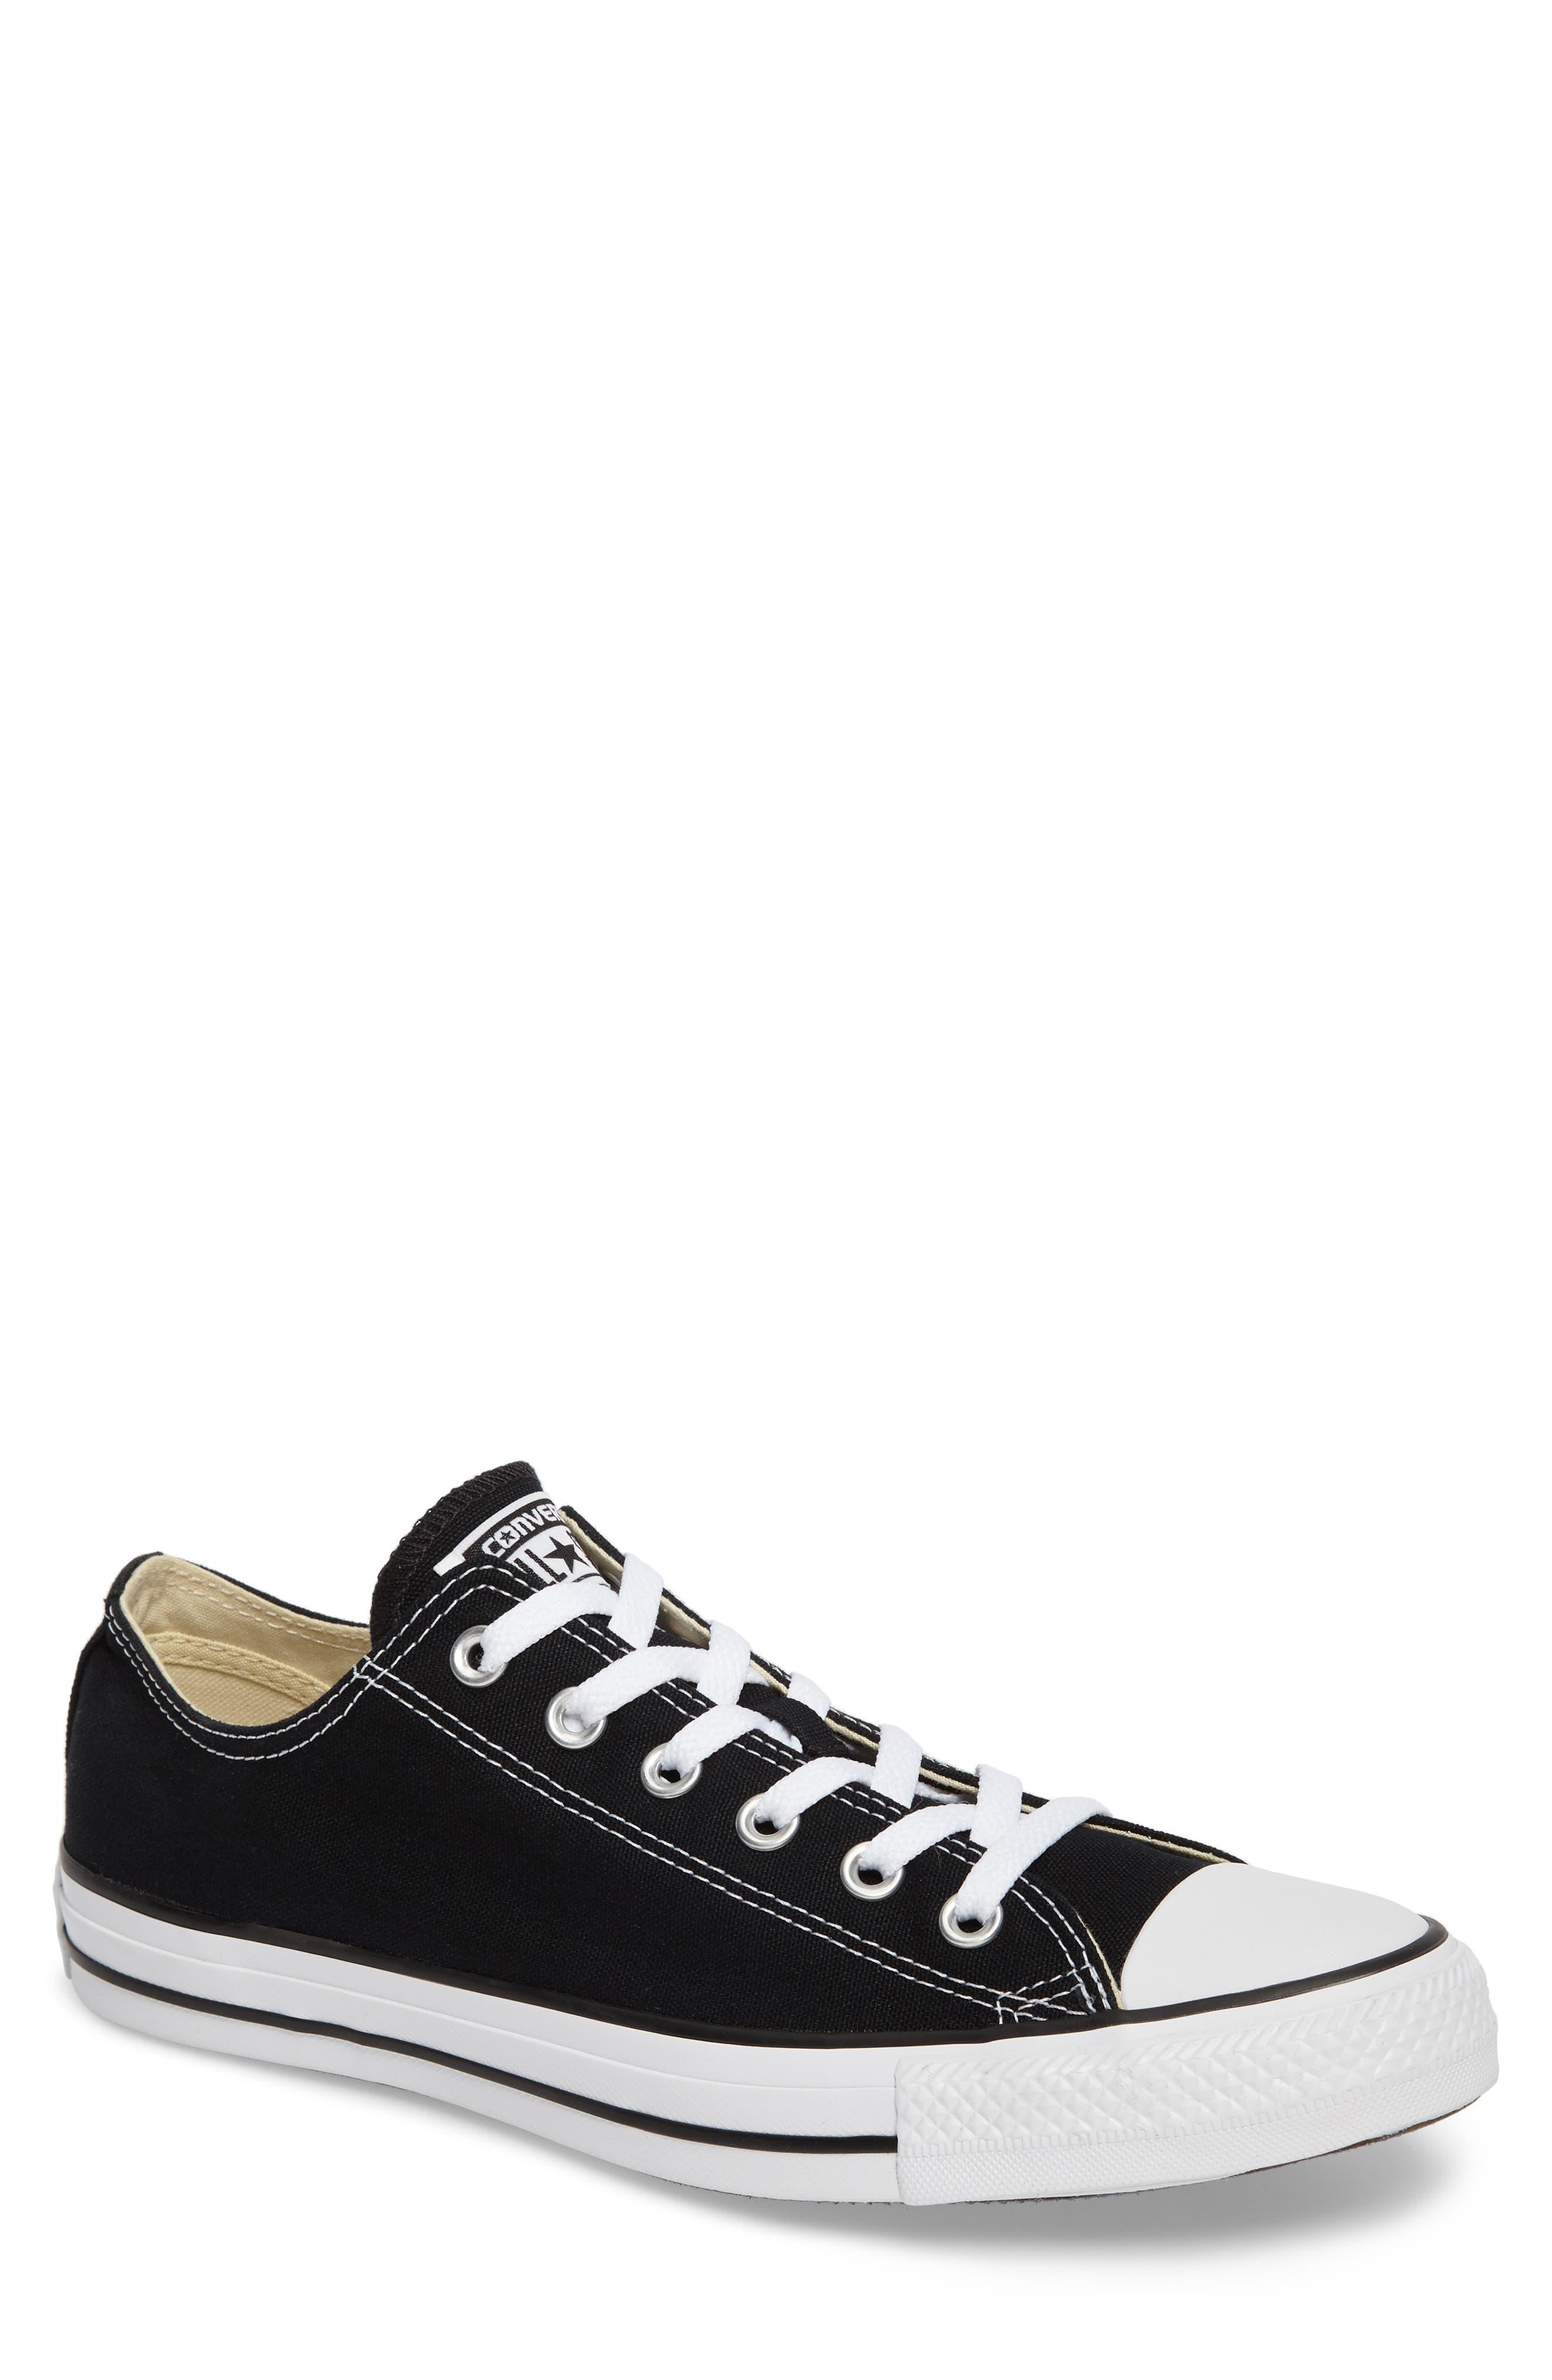 CONVERSE Chuck Taylor<sup>®</sup> Low Sneaker, Main, color, BLACK